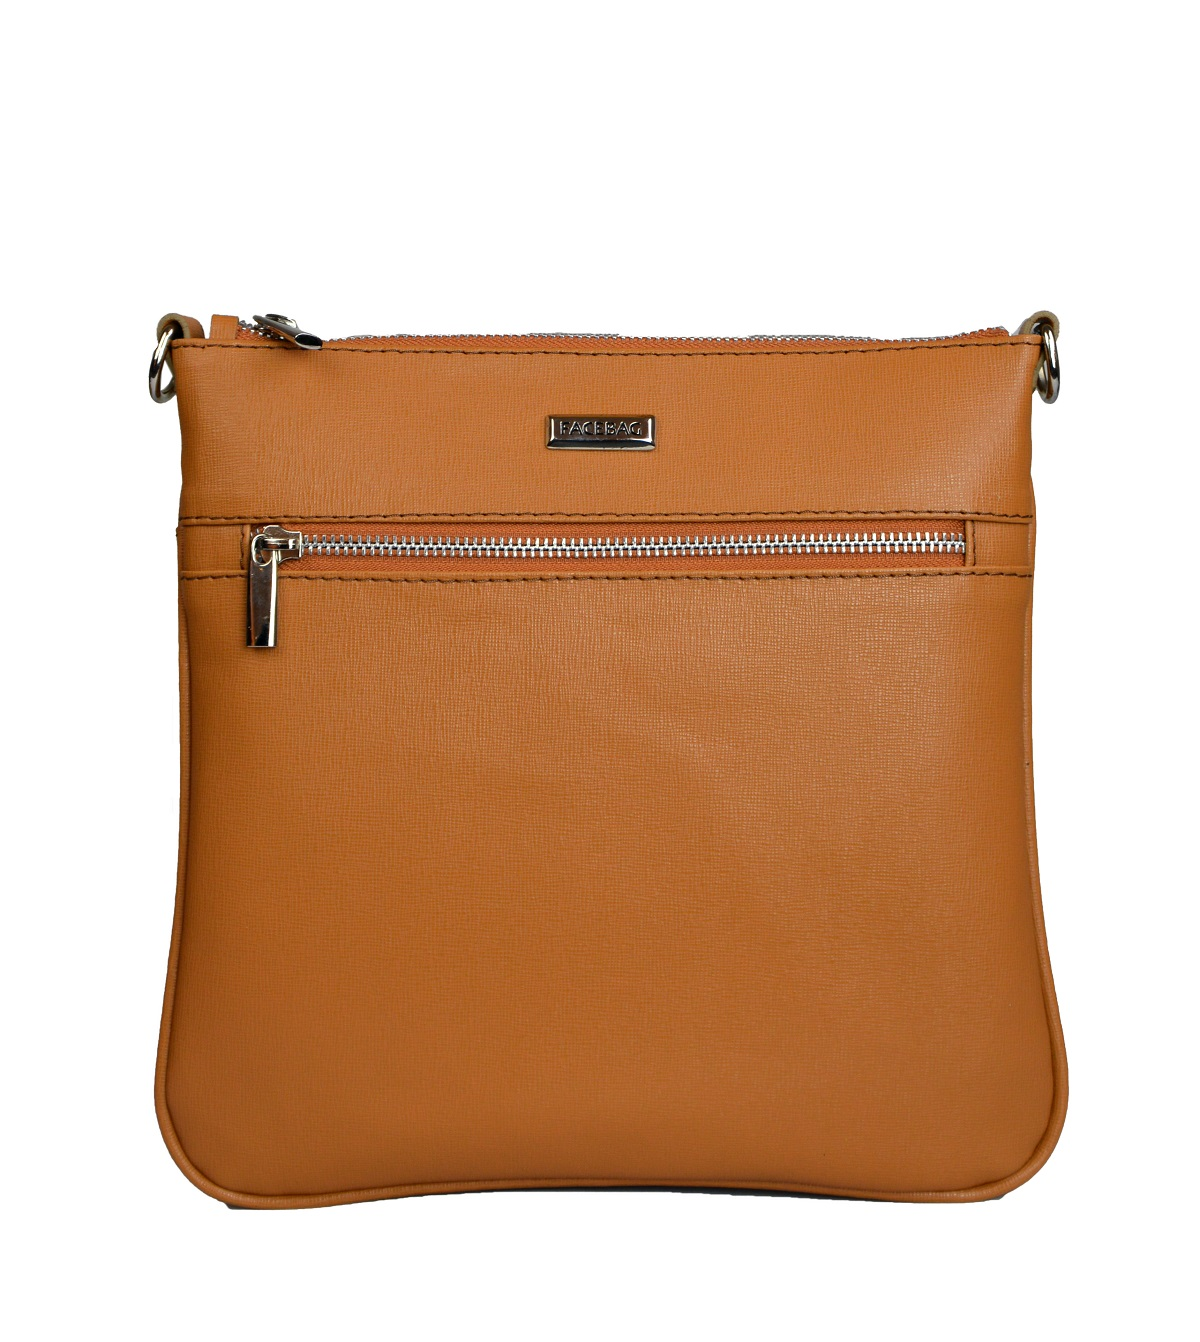 Dámská kožená kabelka FACEBAG VILMA - Cuoio